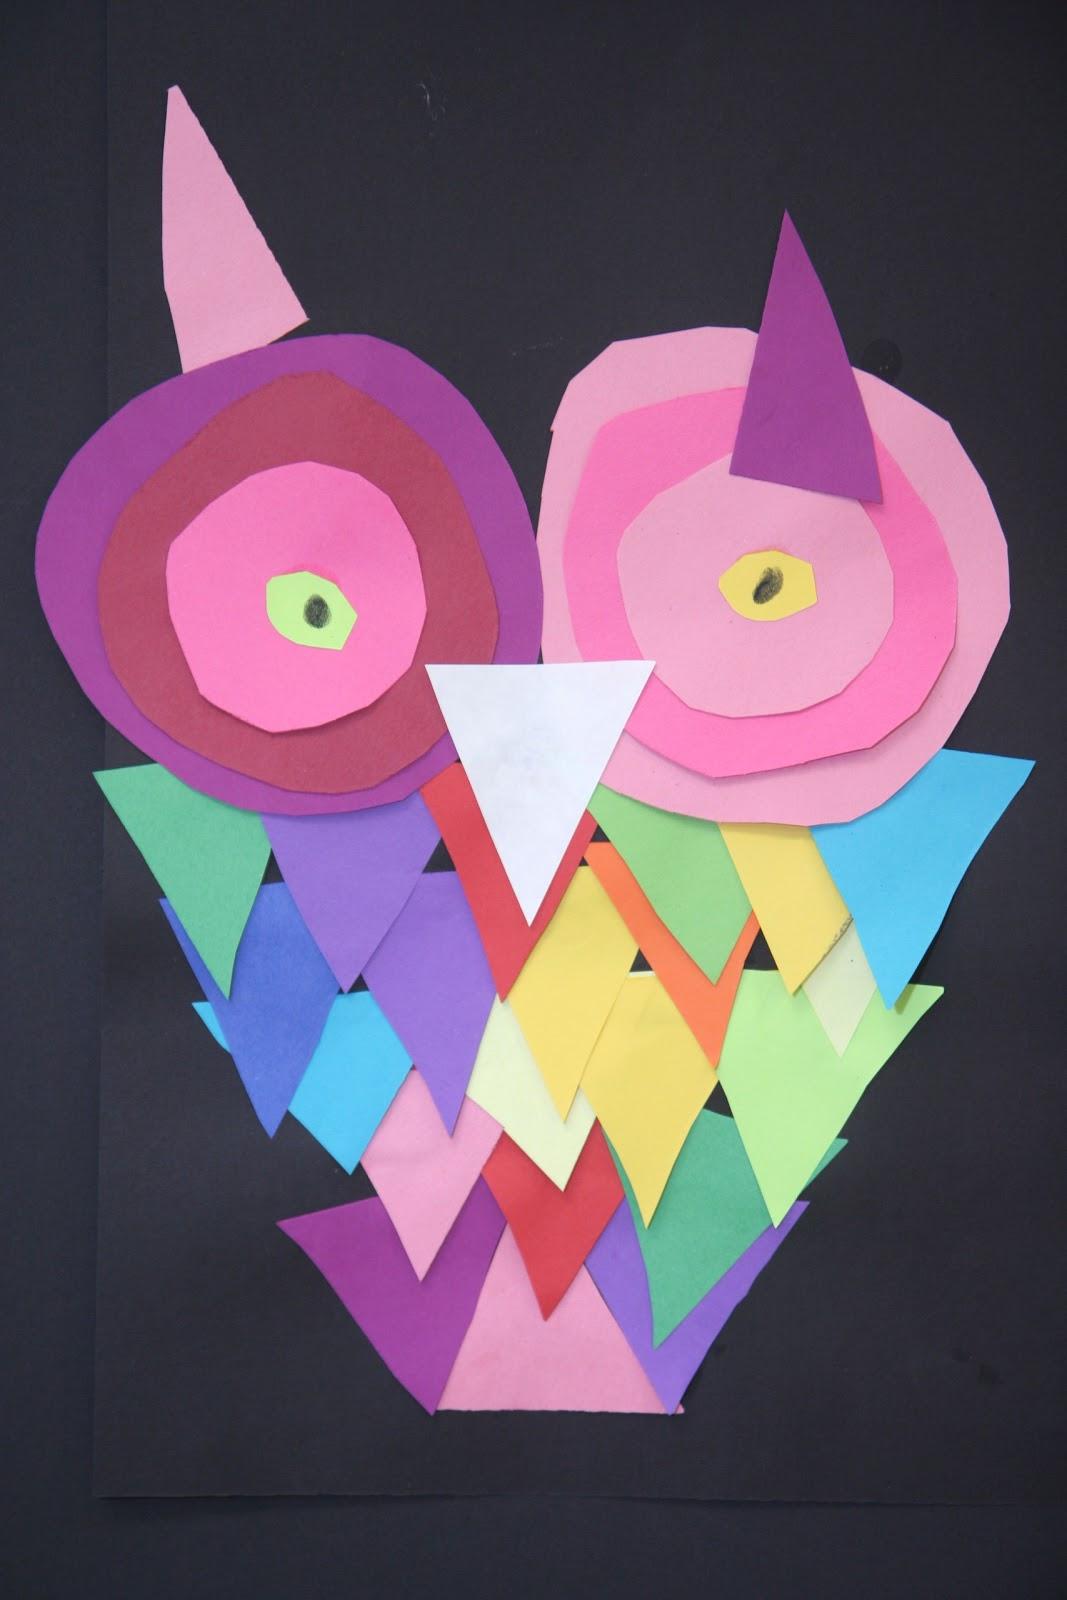 Construction Paper Owls | Beanstalk Mums